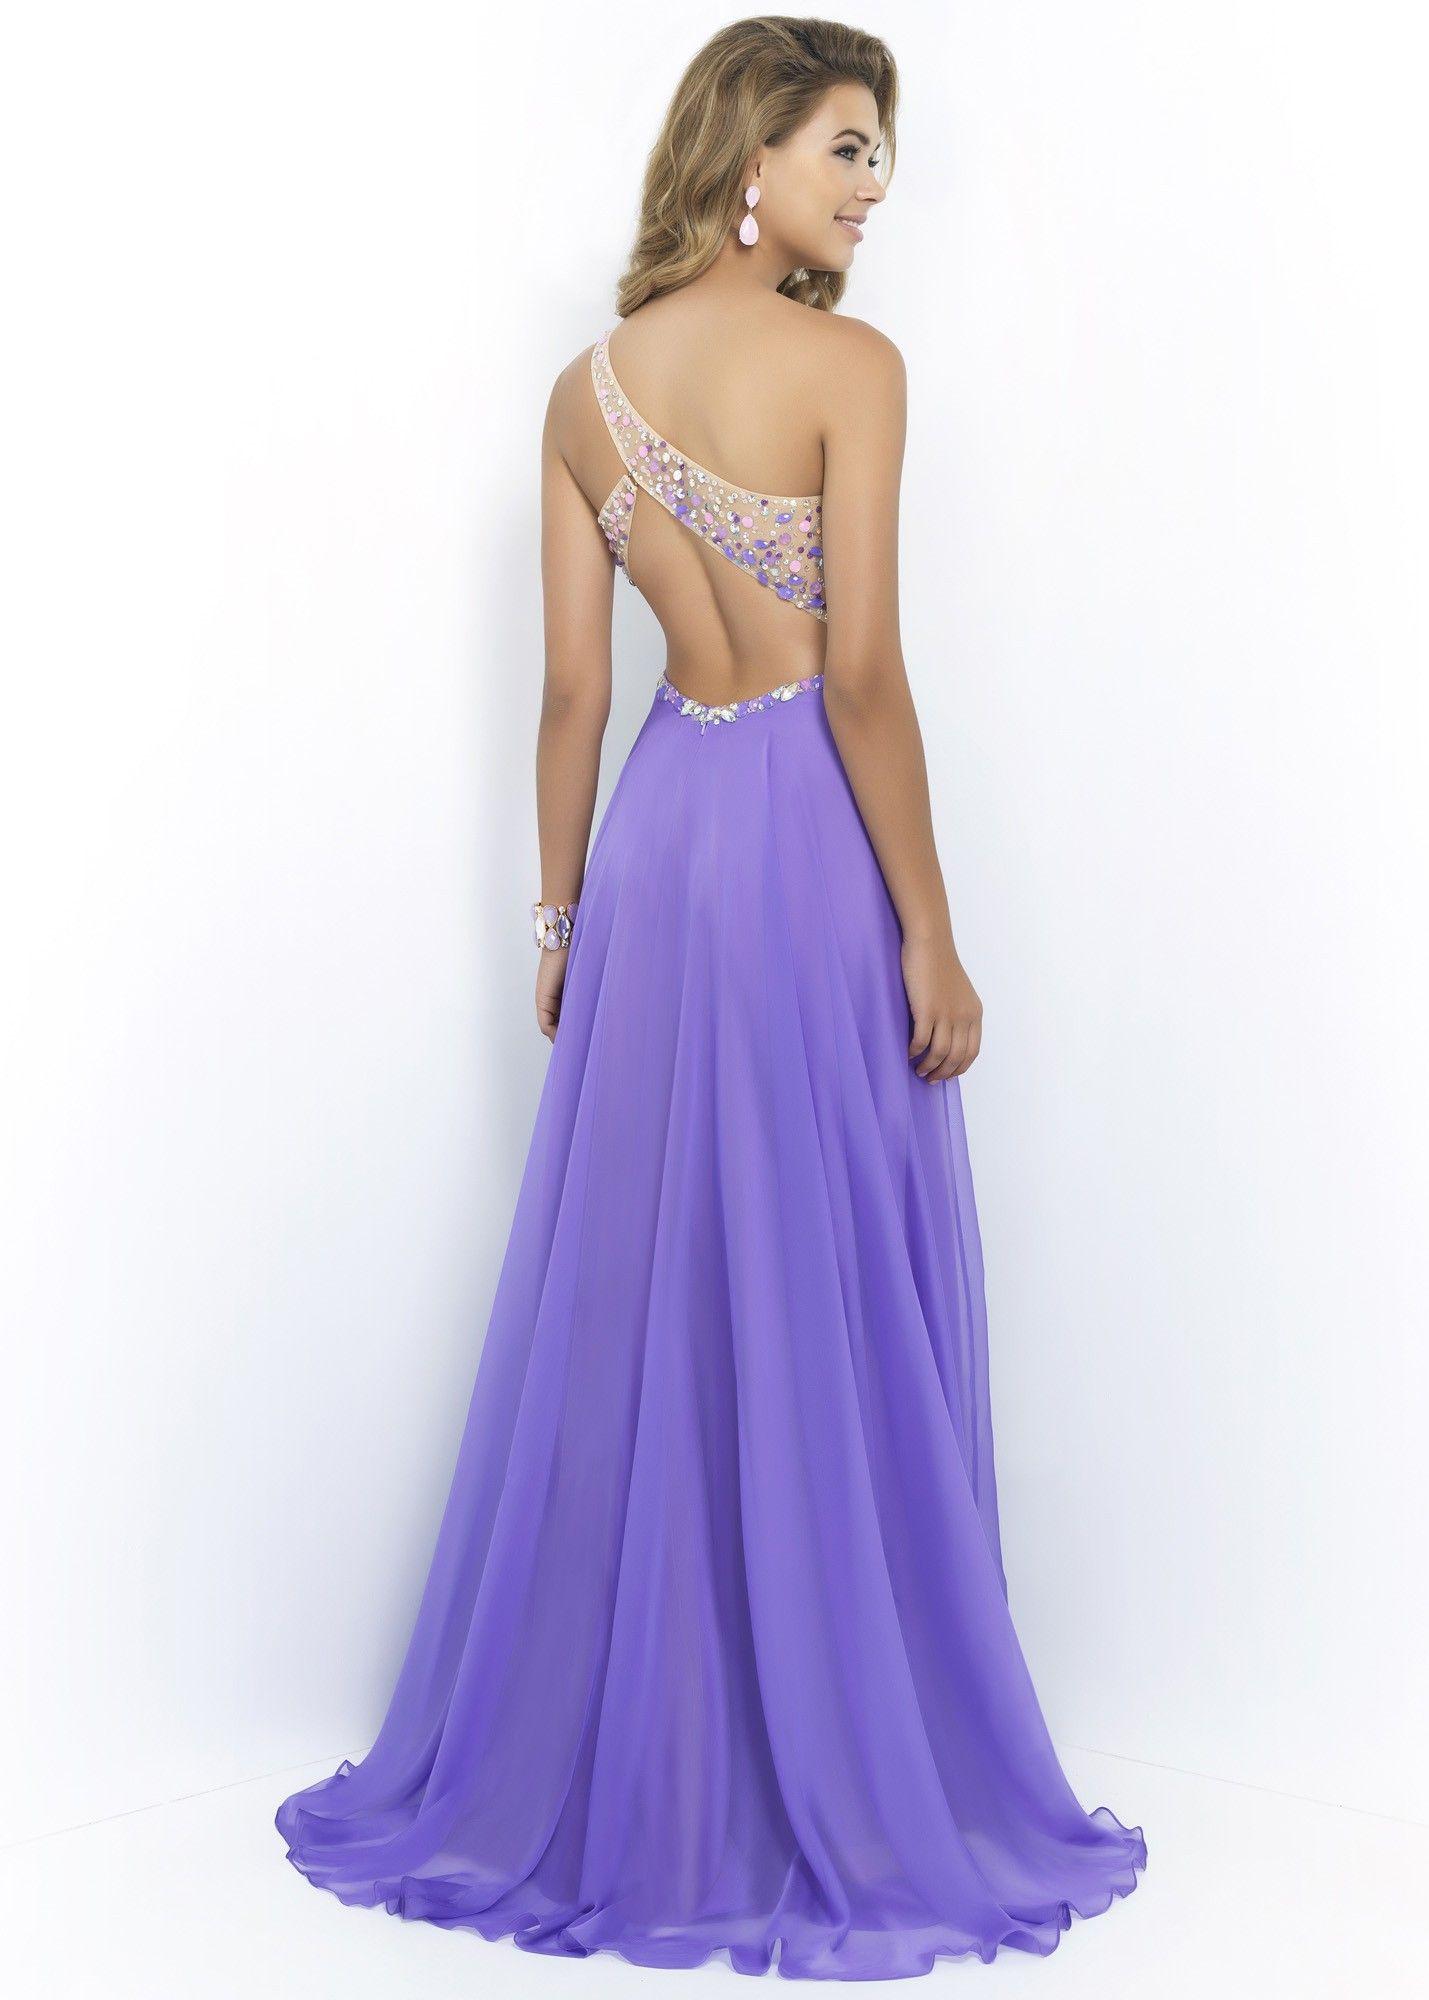 Blush Prom 9965 Beaded One Shoulder Chiffon Dress   Long evening ...